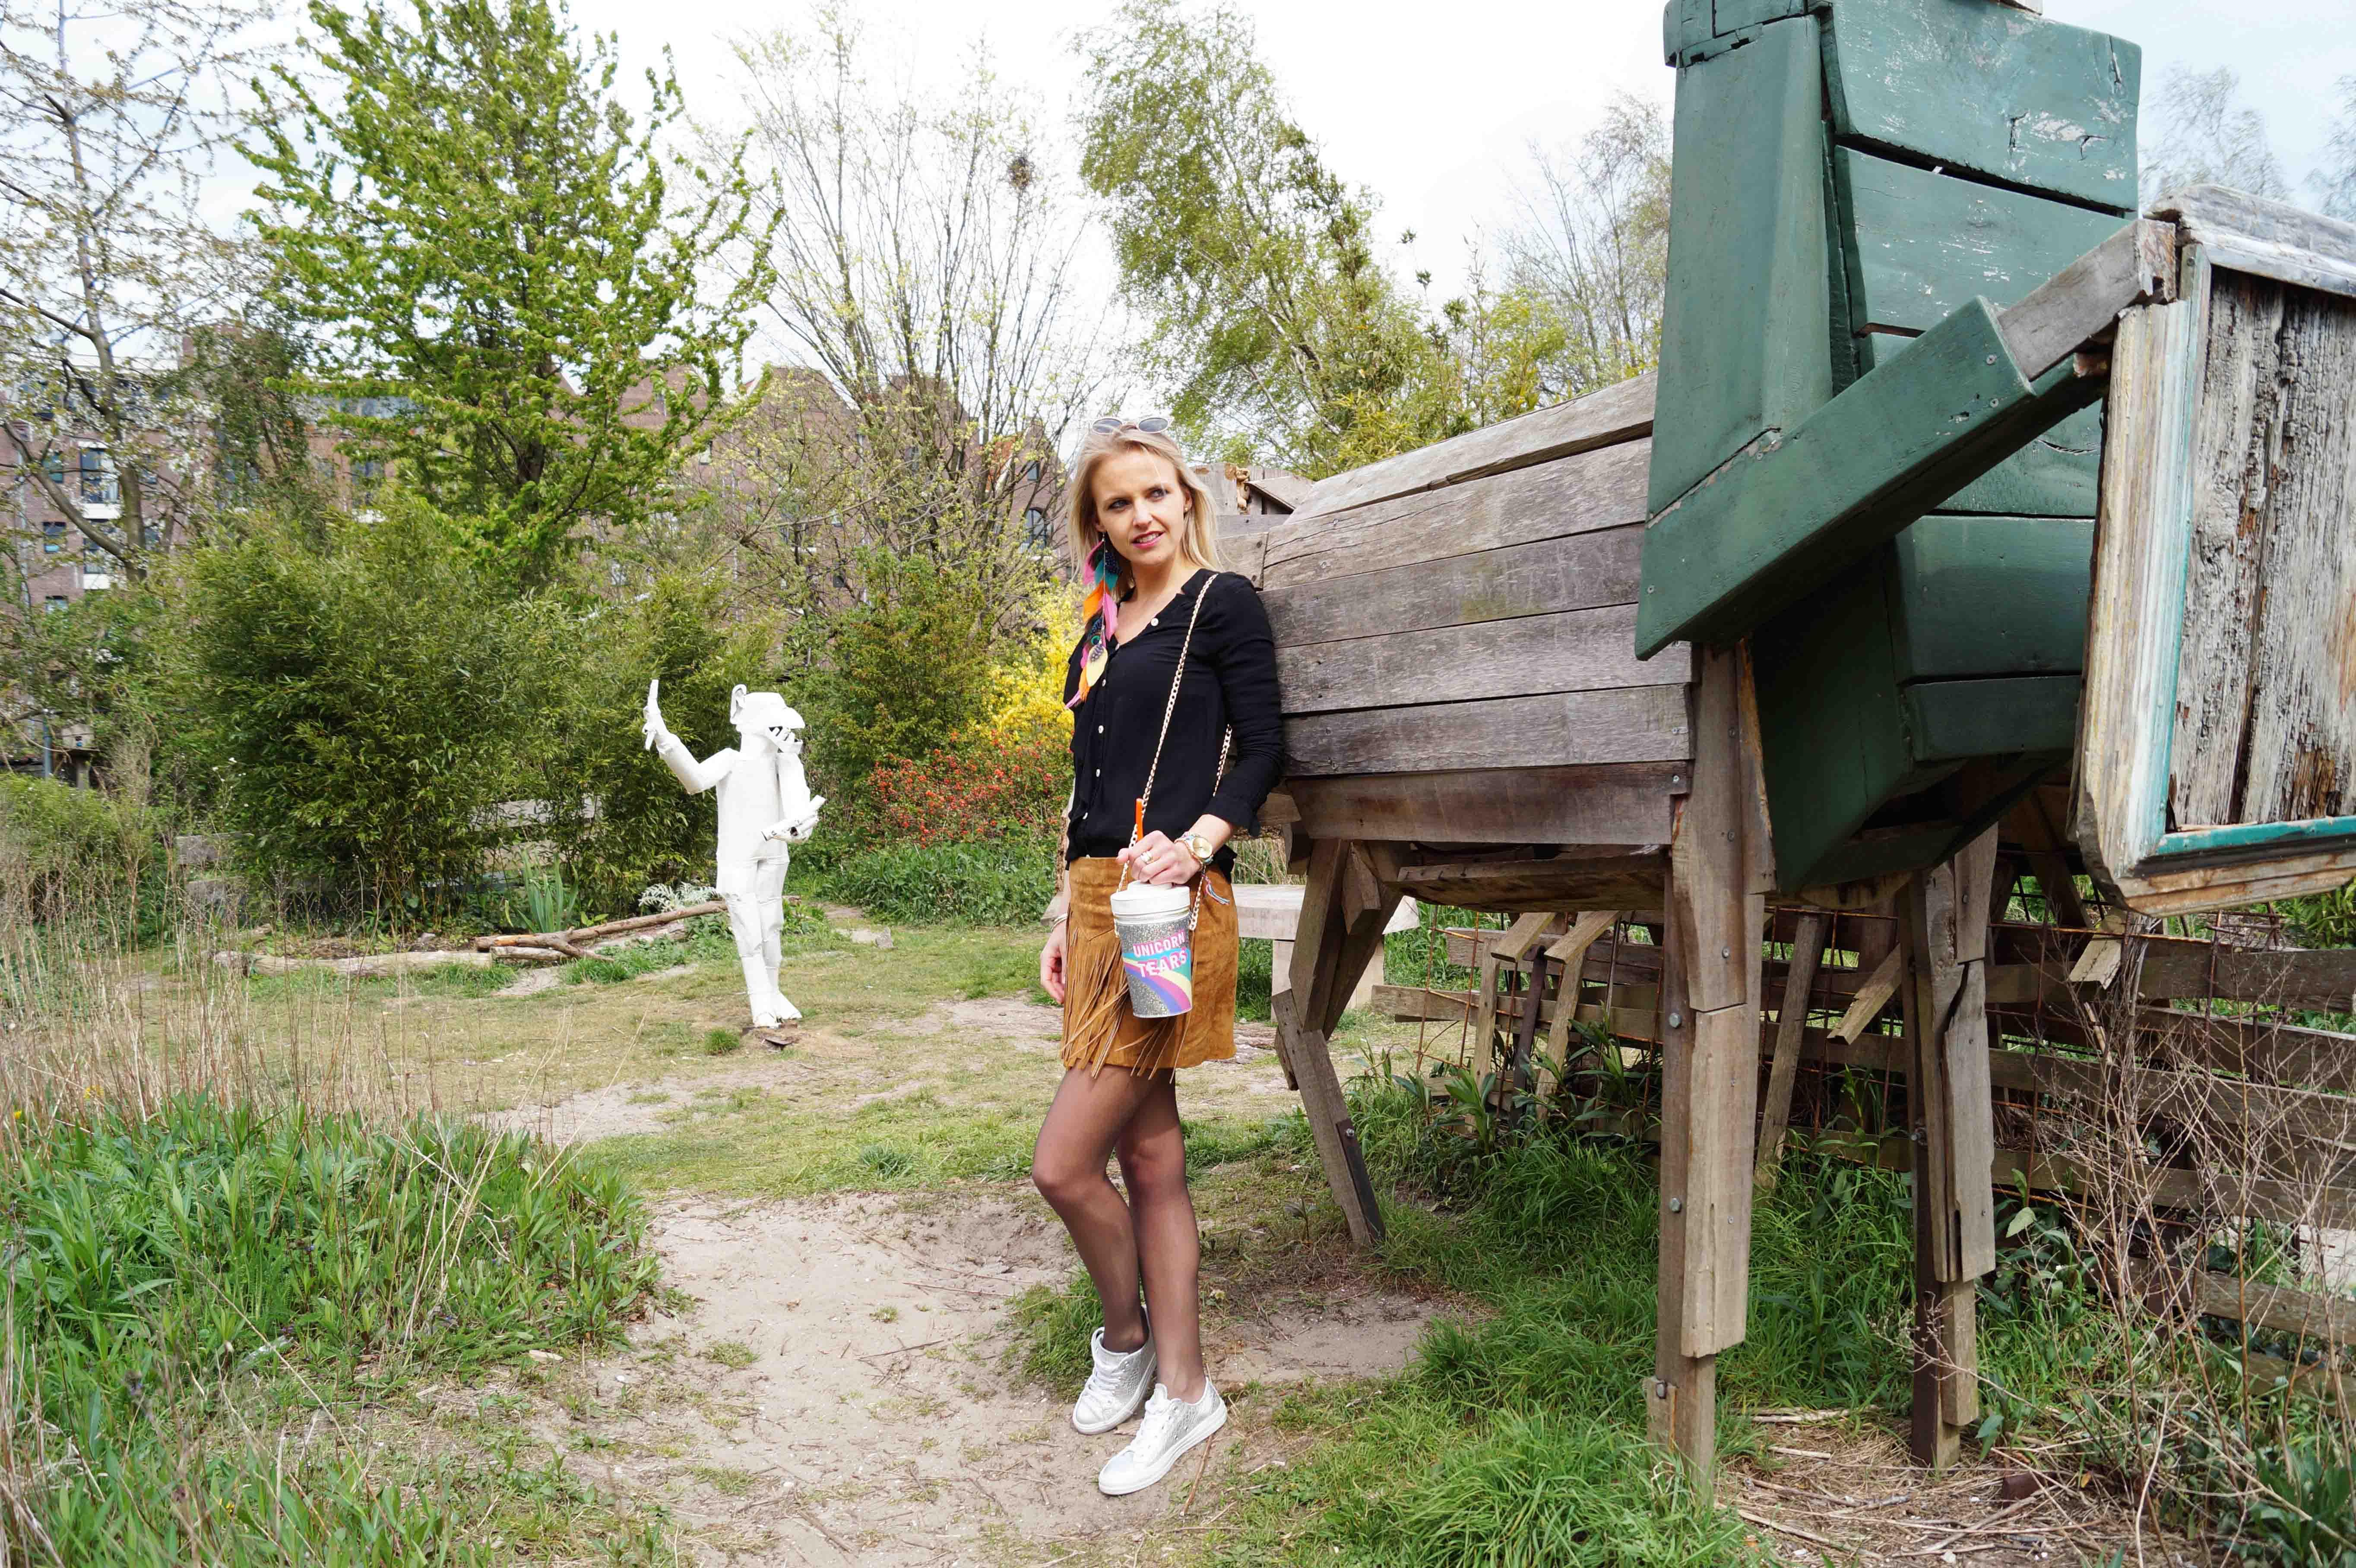 Bag at You - Fashion Blog - Festival outfit - Party Bag - Milkshake tas - Unicorn schoudertas